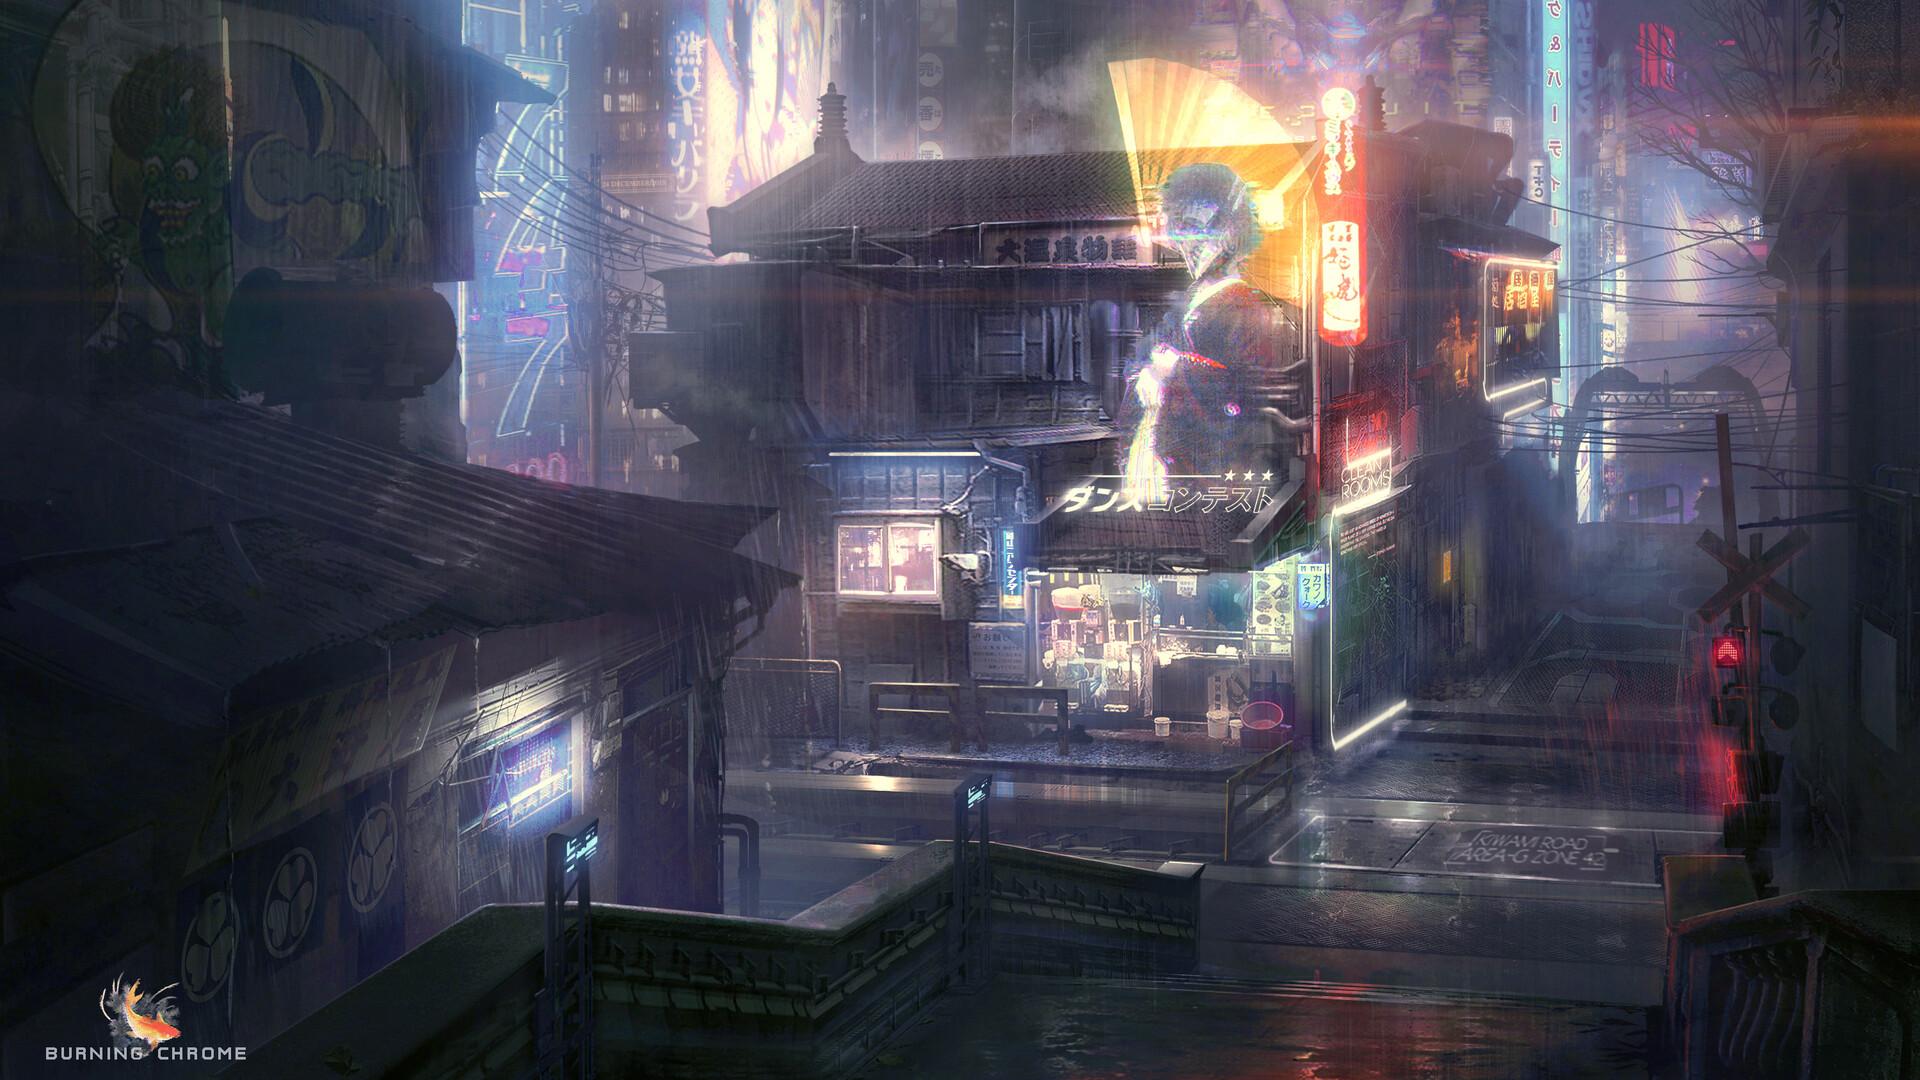 General 1920x1080 futuristic futuristic city neon lights hologram cyberpunk digital art artwork city Chinese architecture Chinese rain Evan Liu science fiction